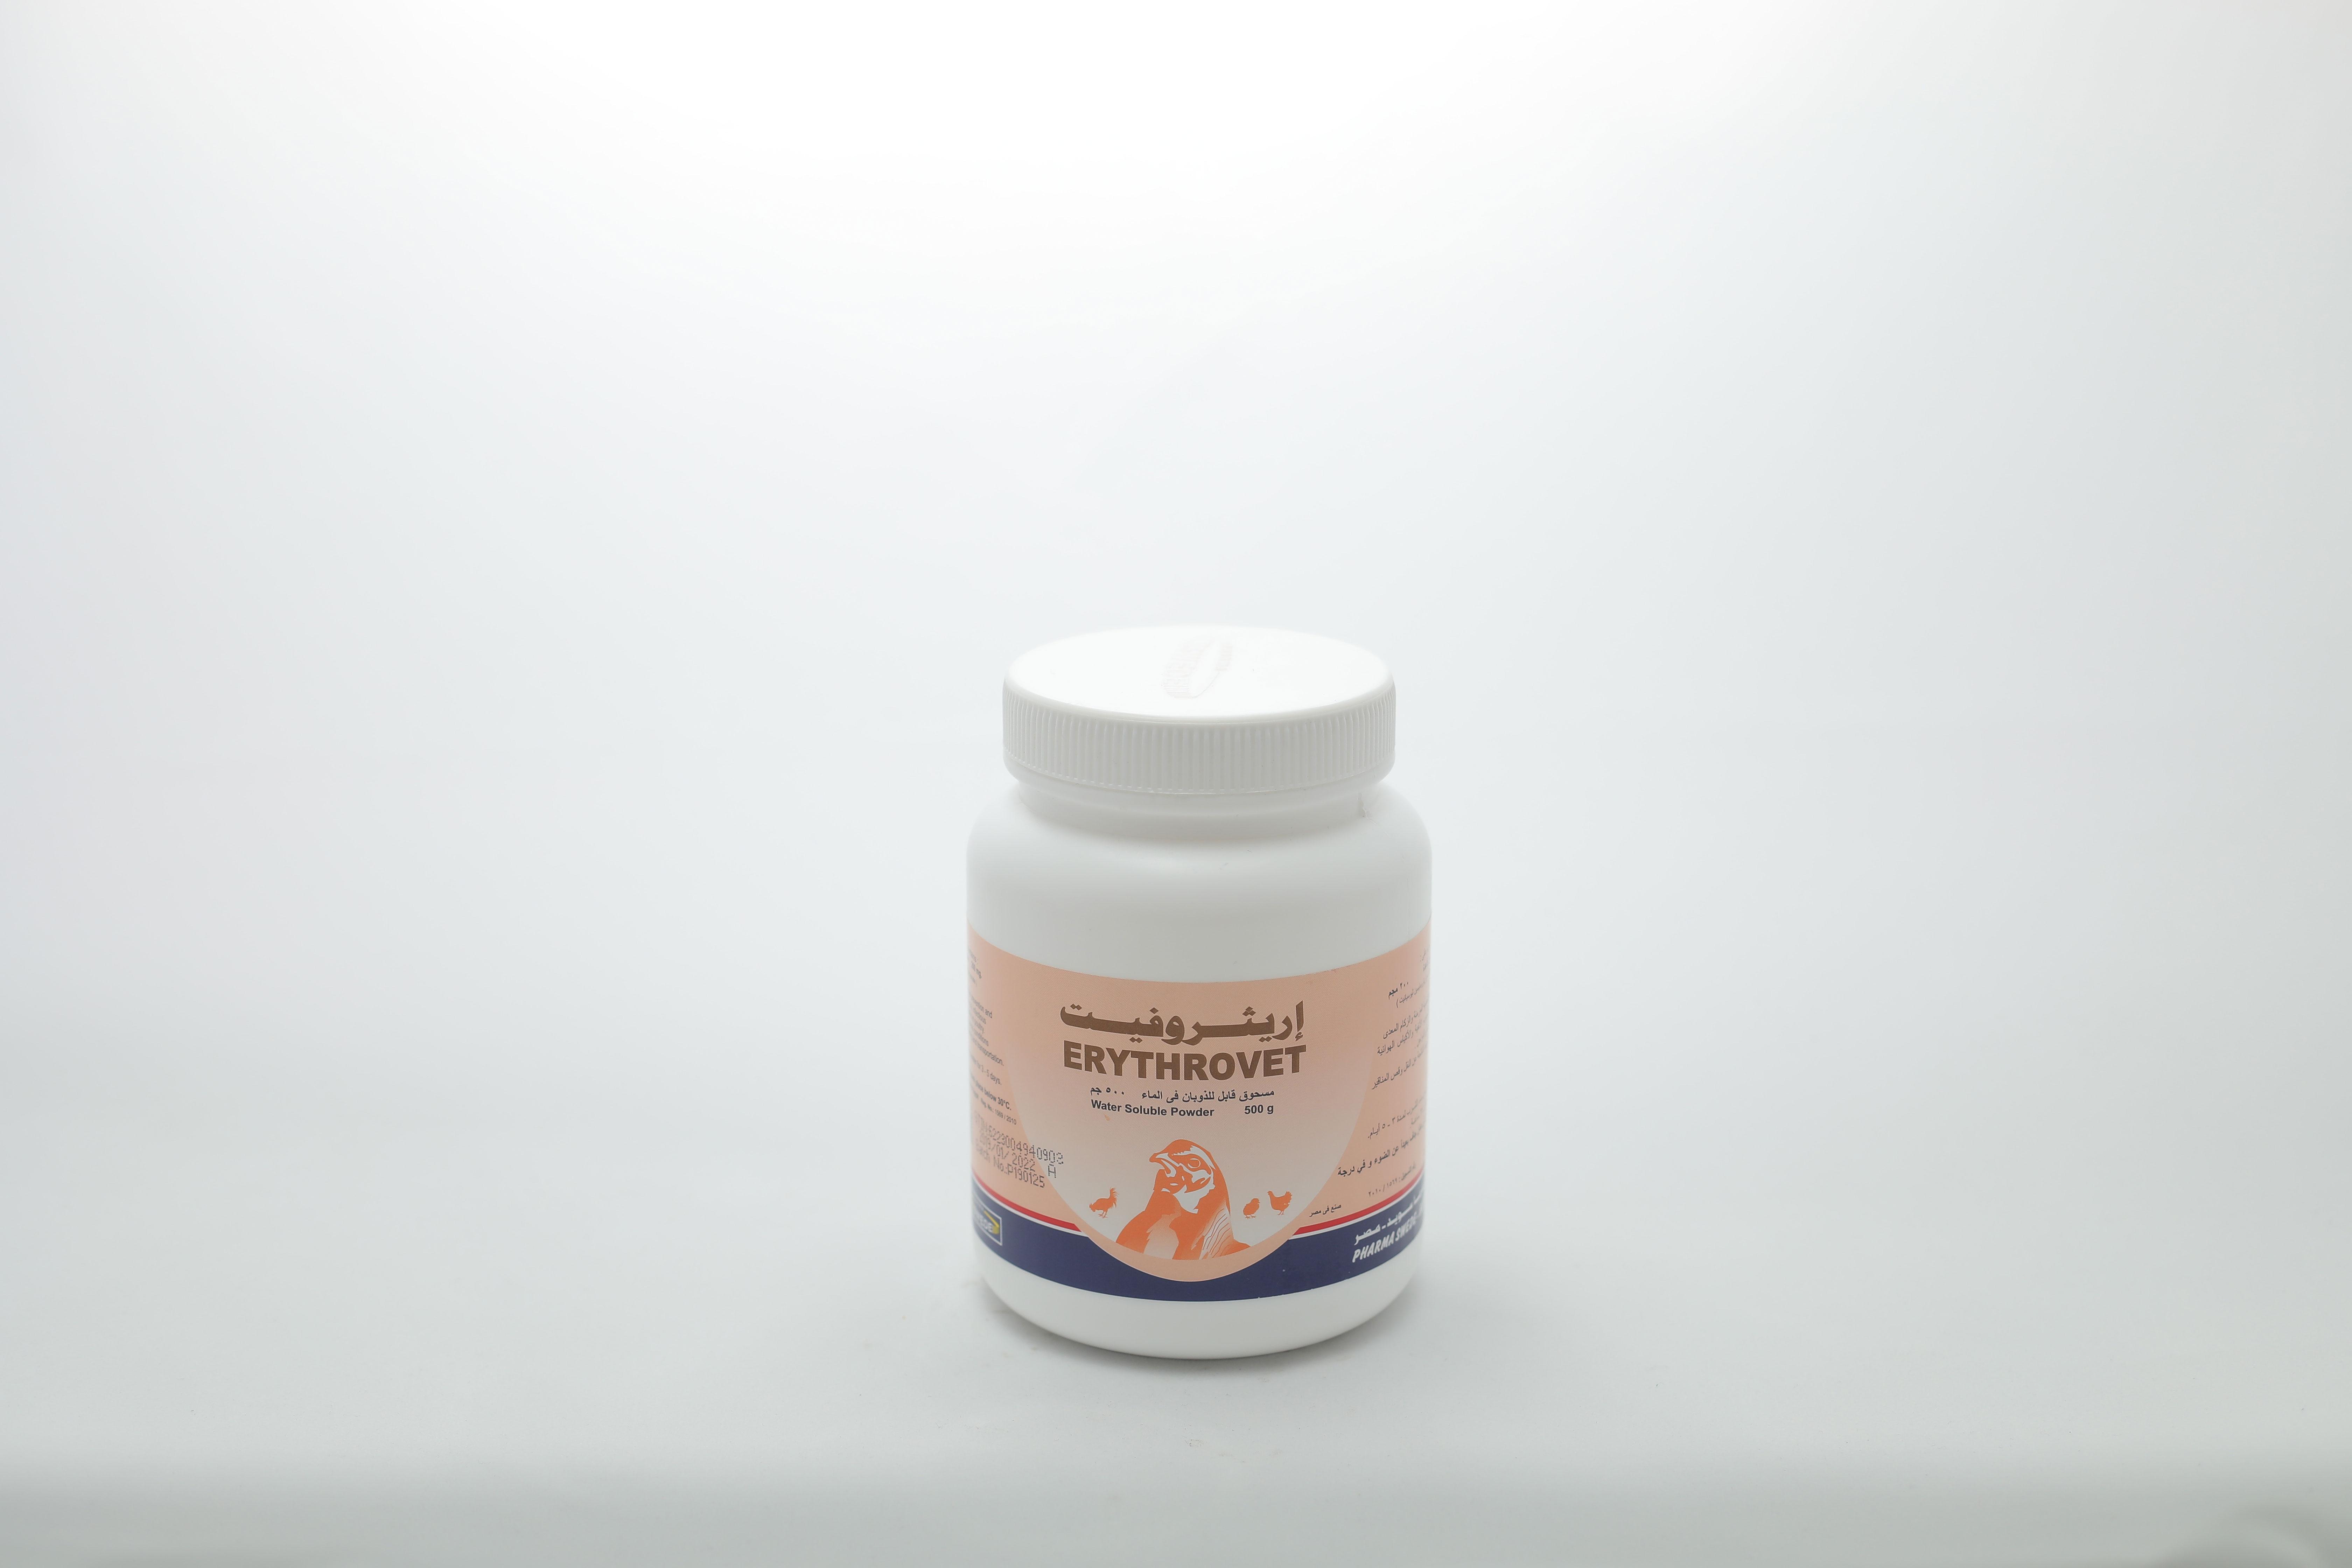 Erythrovet 20% WSP